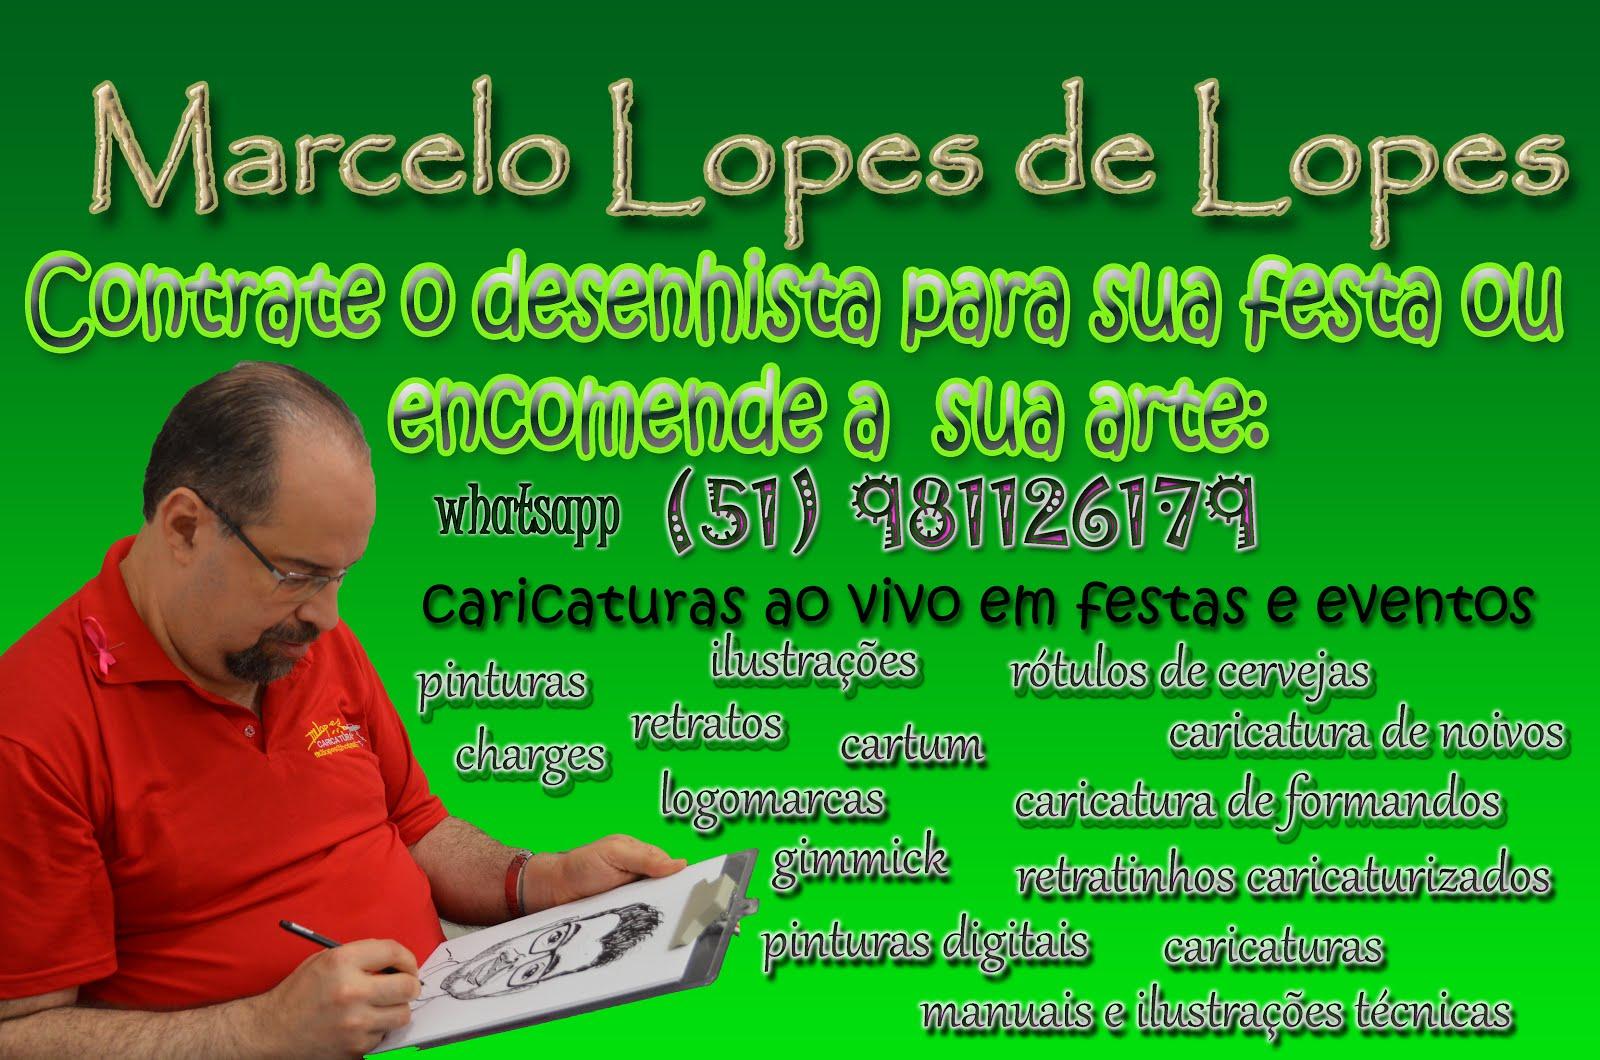 Caricaturas e desenhos Marcelo Lopes de Lopes, Porto Alegre